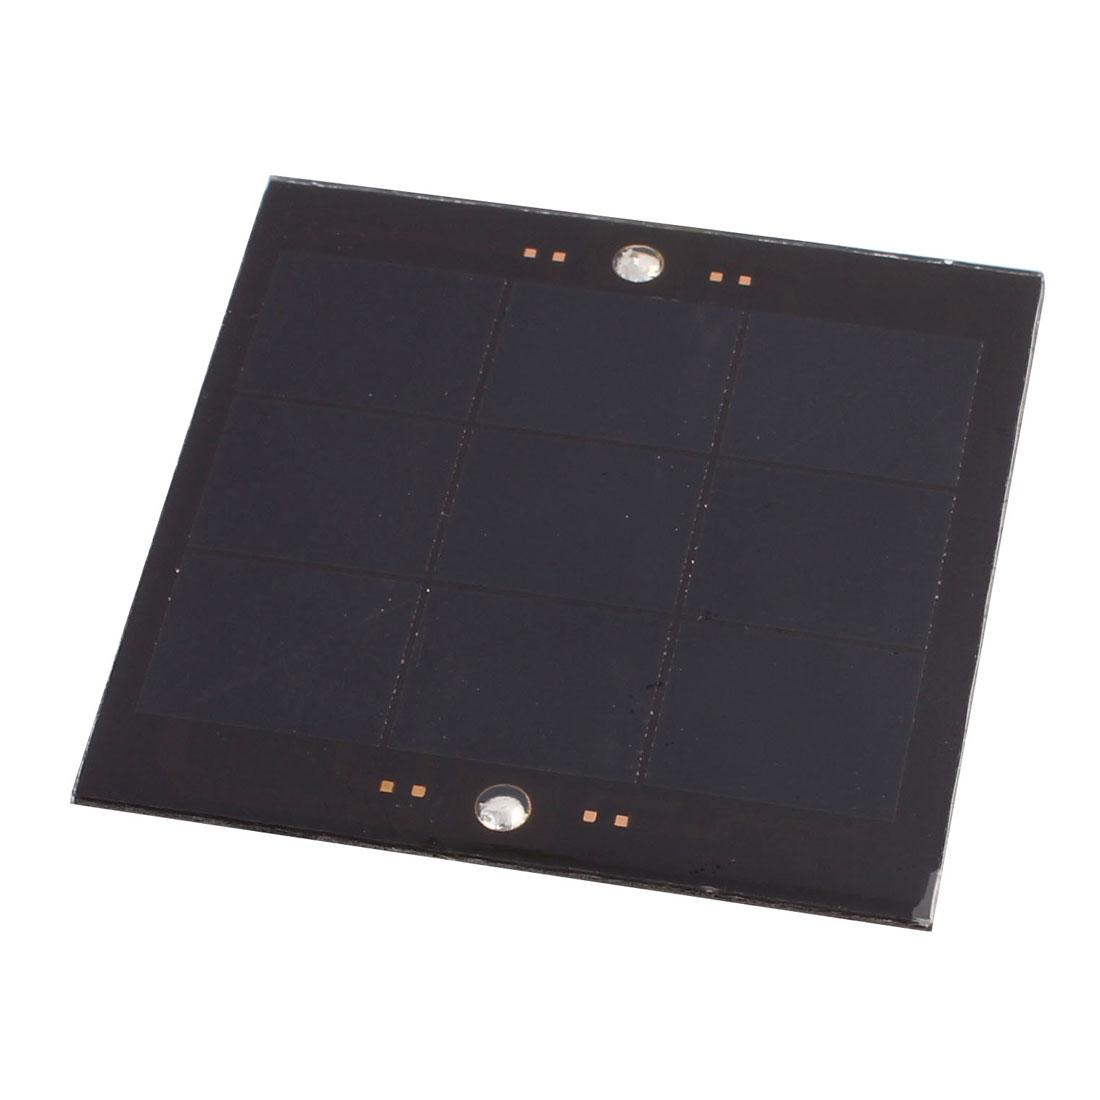 5V 120mA Polycrystalline Solar Cell Panel Module Charging Board 55mm x 55mm